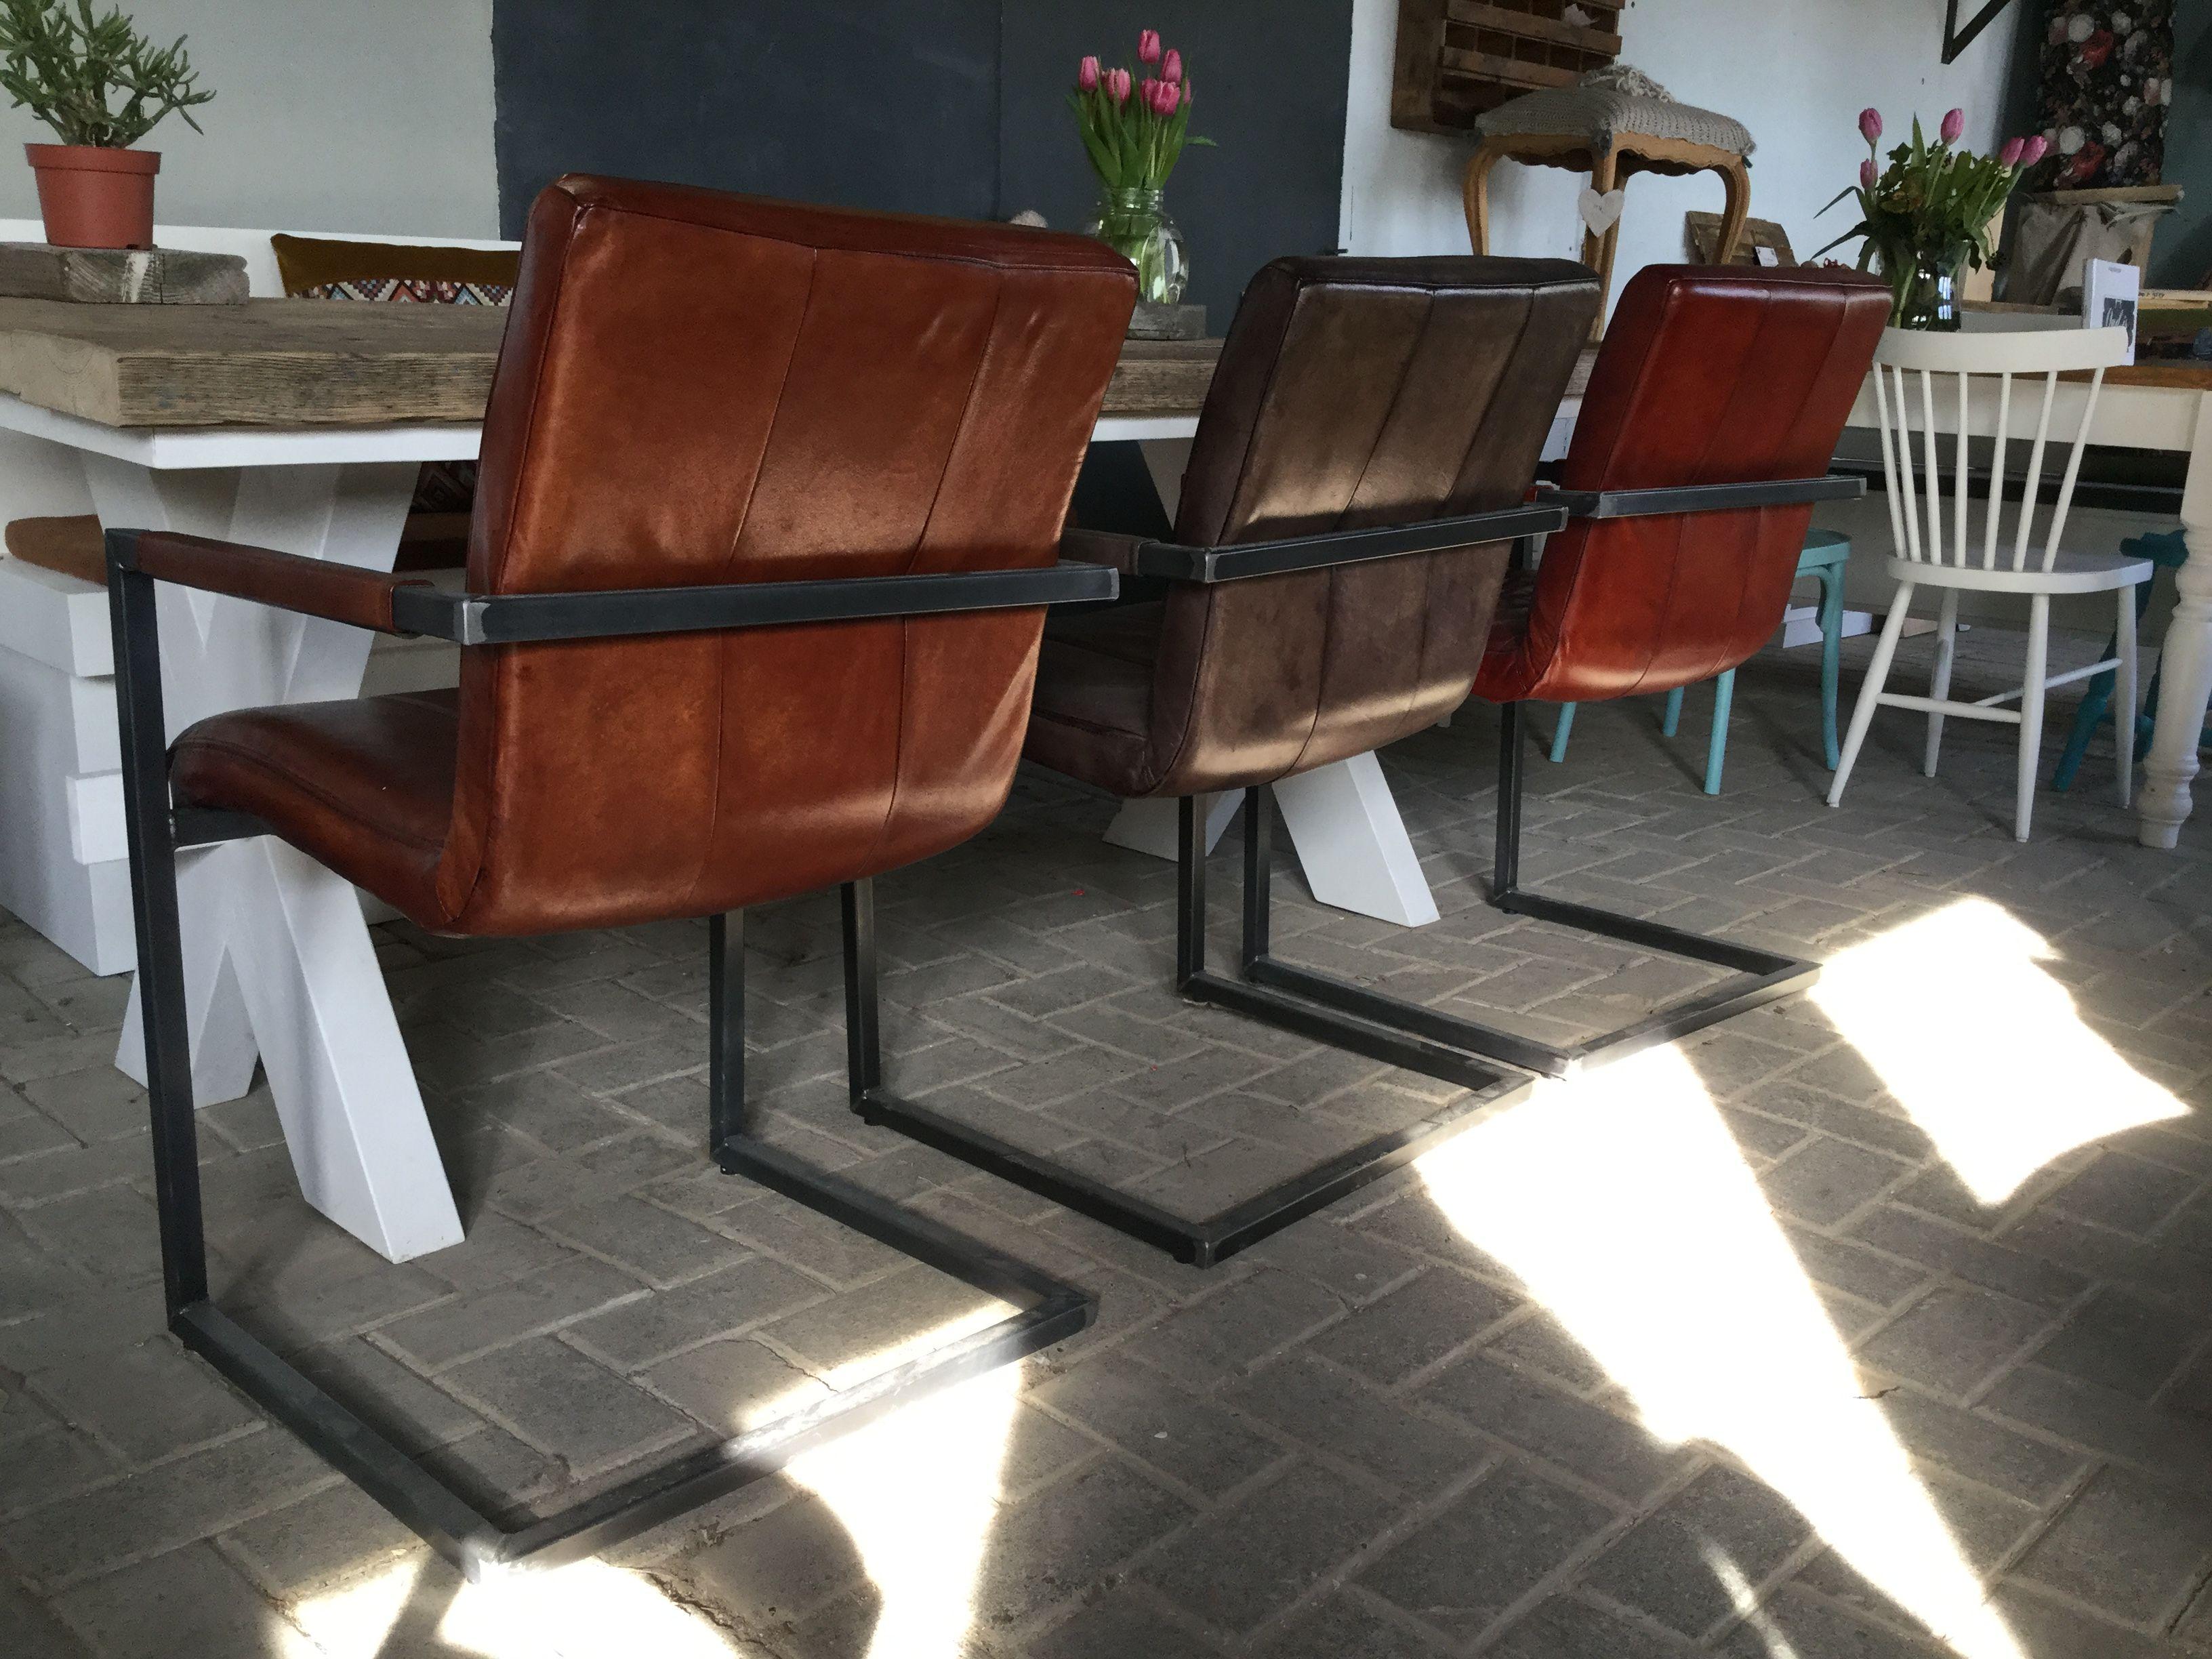 Stoer Industriele Eetkamerstoelen : Stoere industriële stoelen met buffelleer en metalen frame